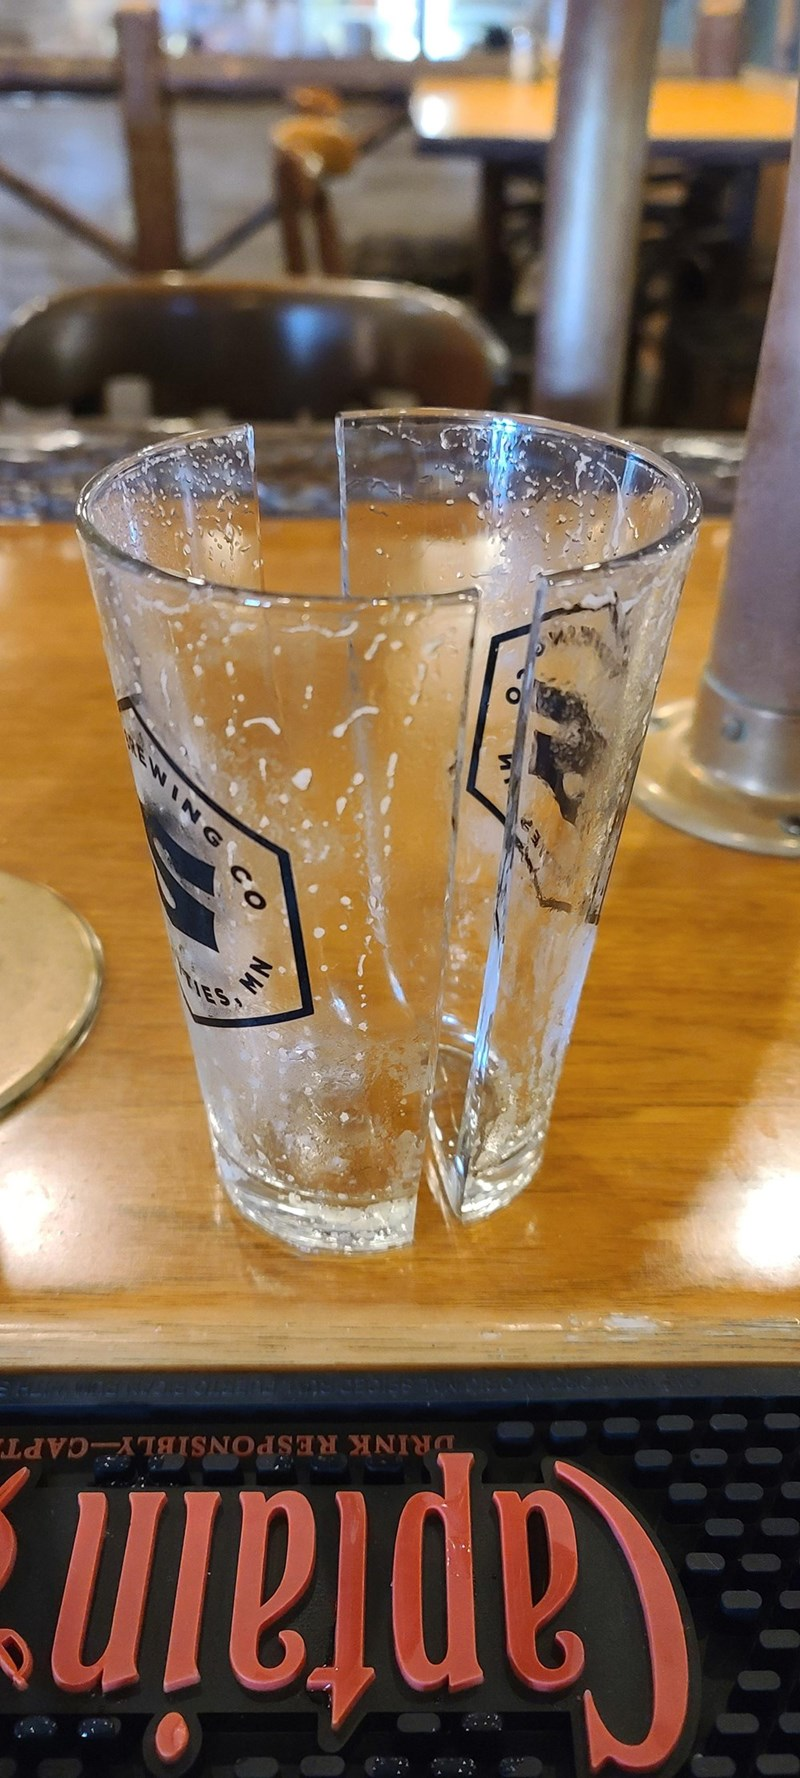 Drinkware - Captain DRINK RESPONSIBLY CAPT. ies NG CO MN